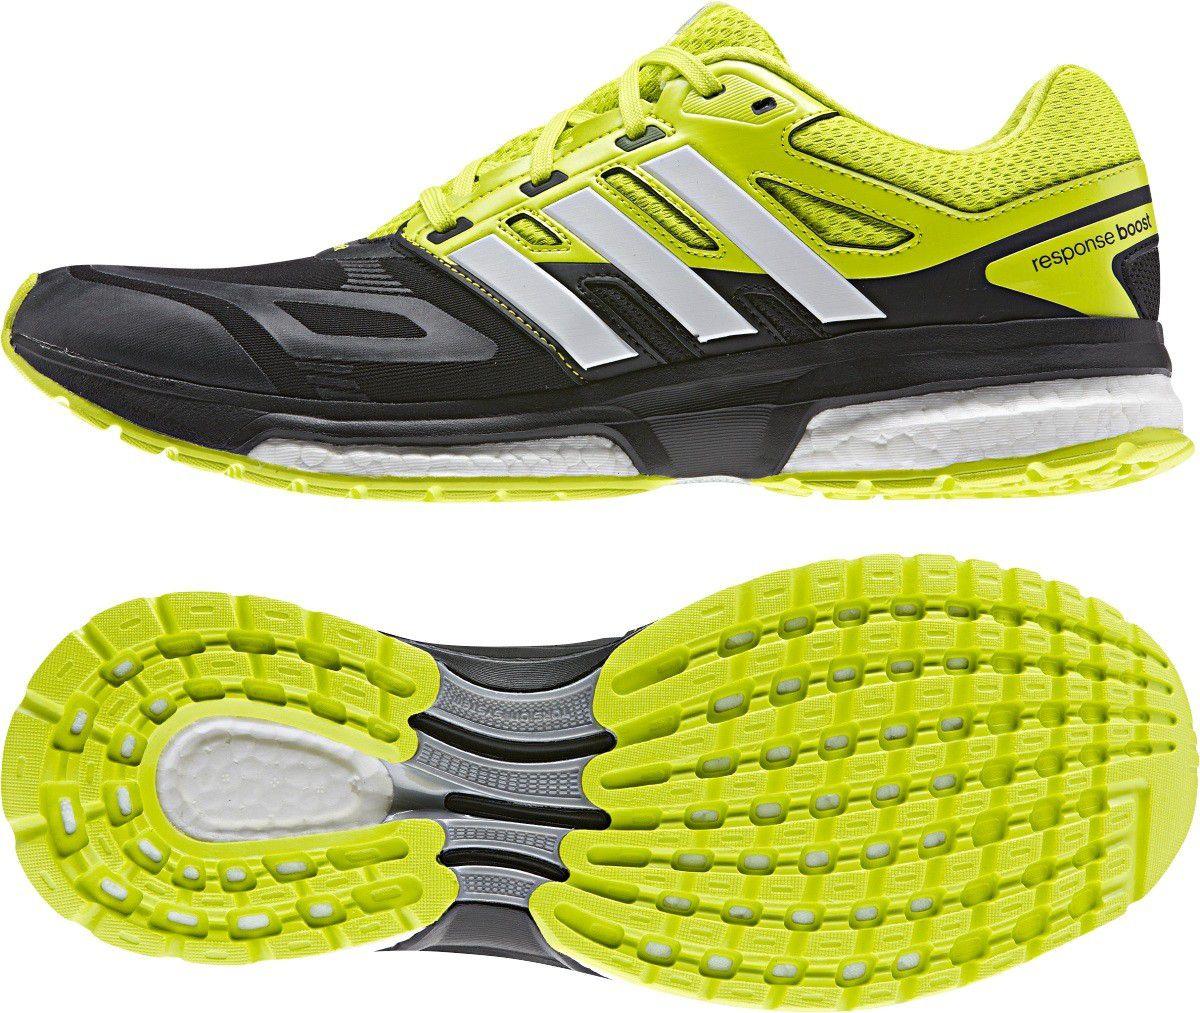 adidas response boost endless energy